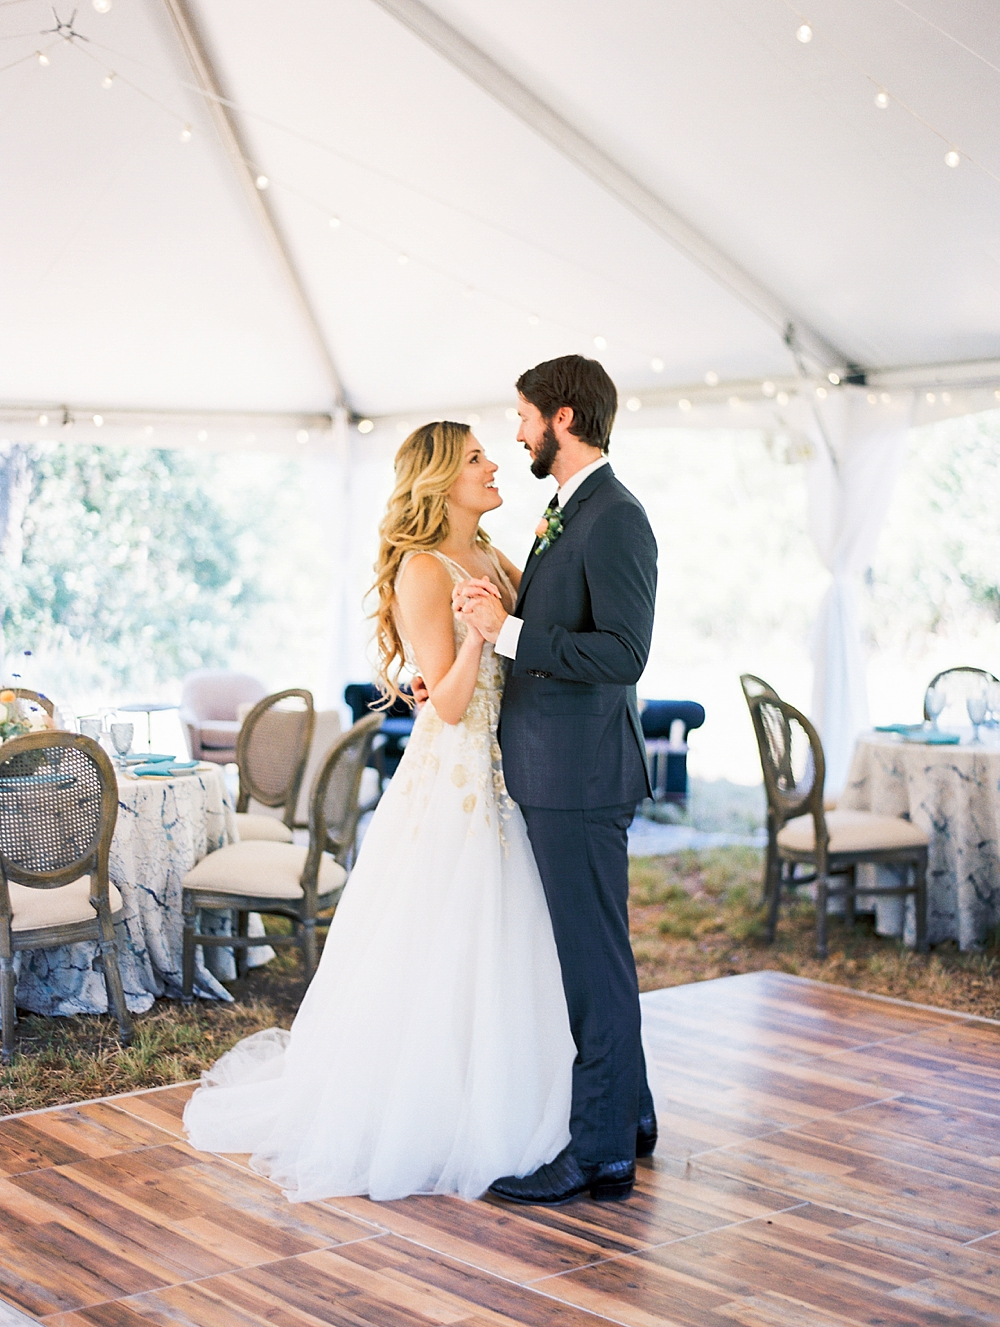 Kristin-La-Voie-Photography-Austin-Wedding-Photographer-the-grand-lady-148